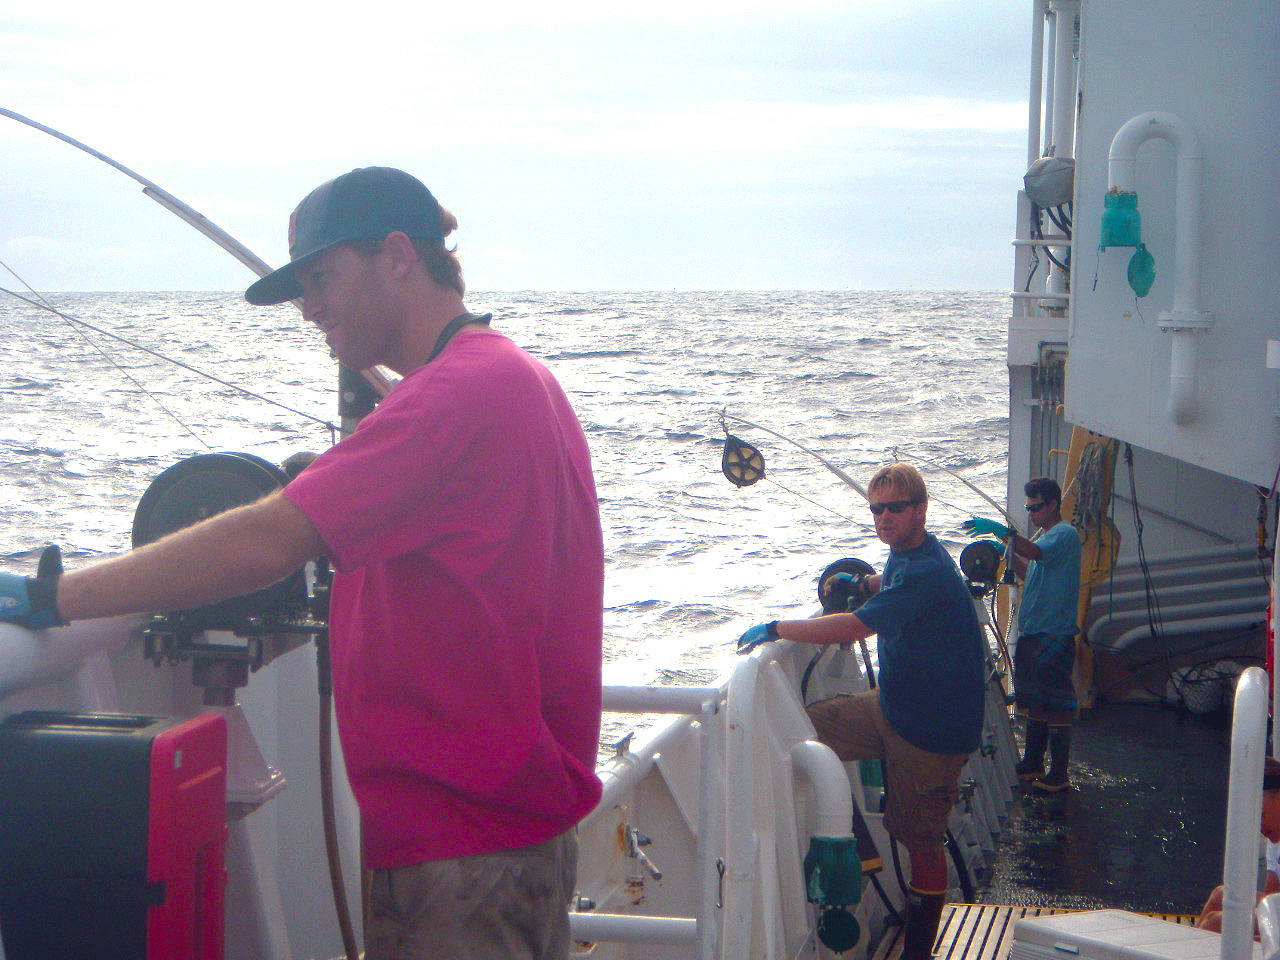 Bottomfish sampling from the NOAA ShipSette.